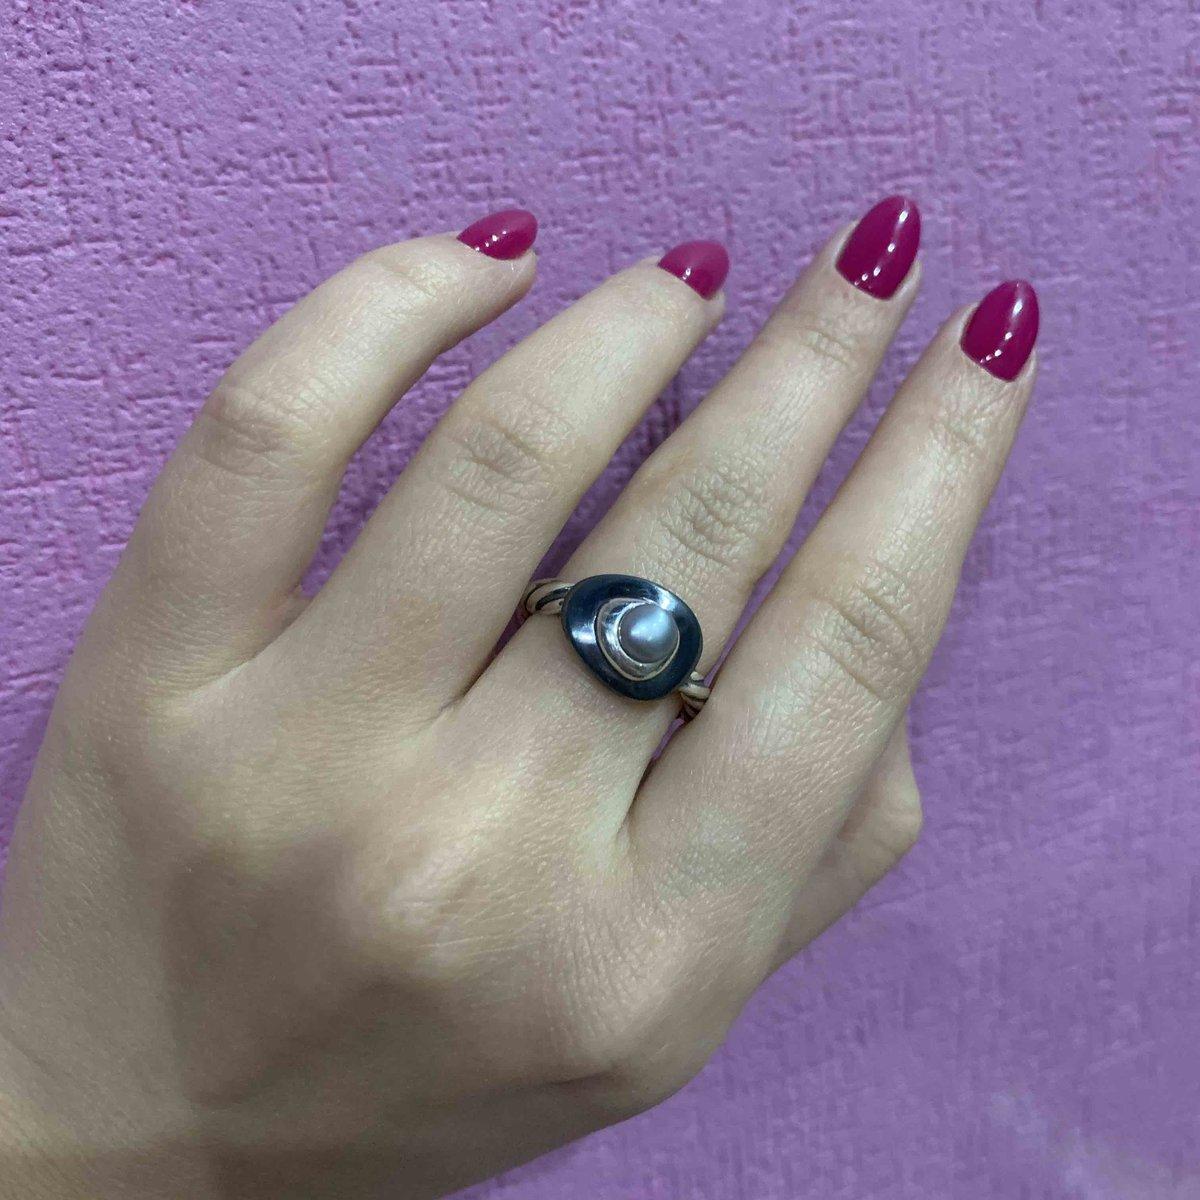 Безумно красивое кольцо без изъянов